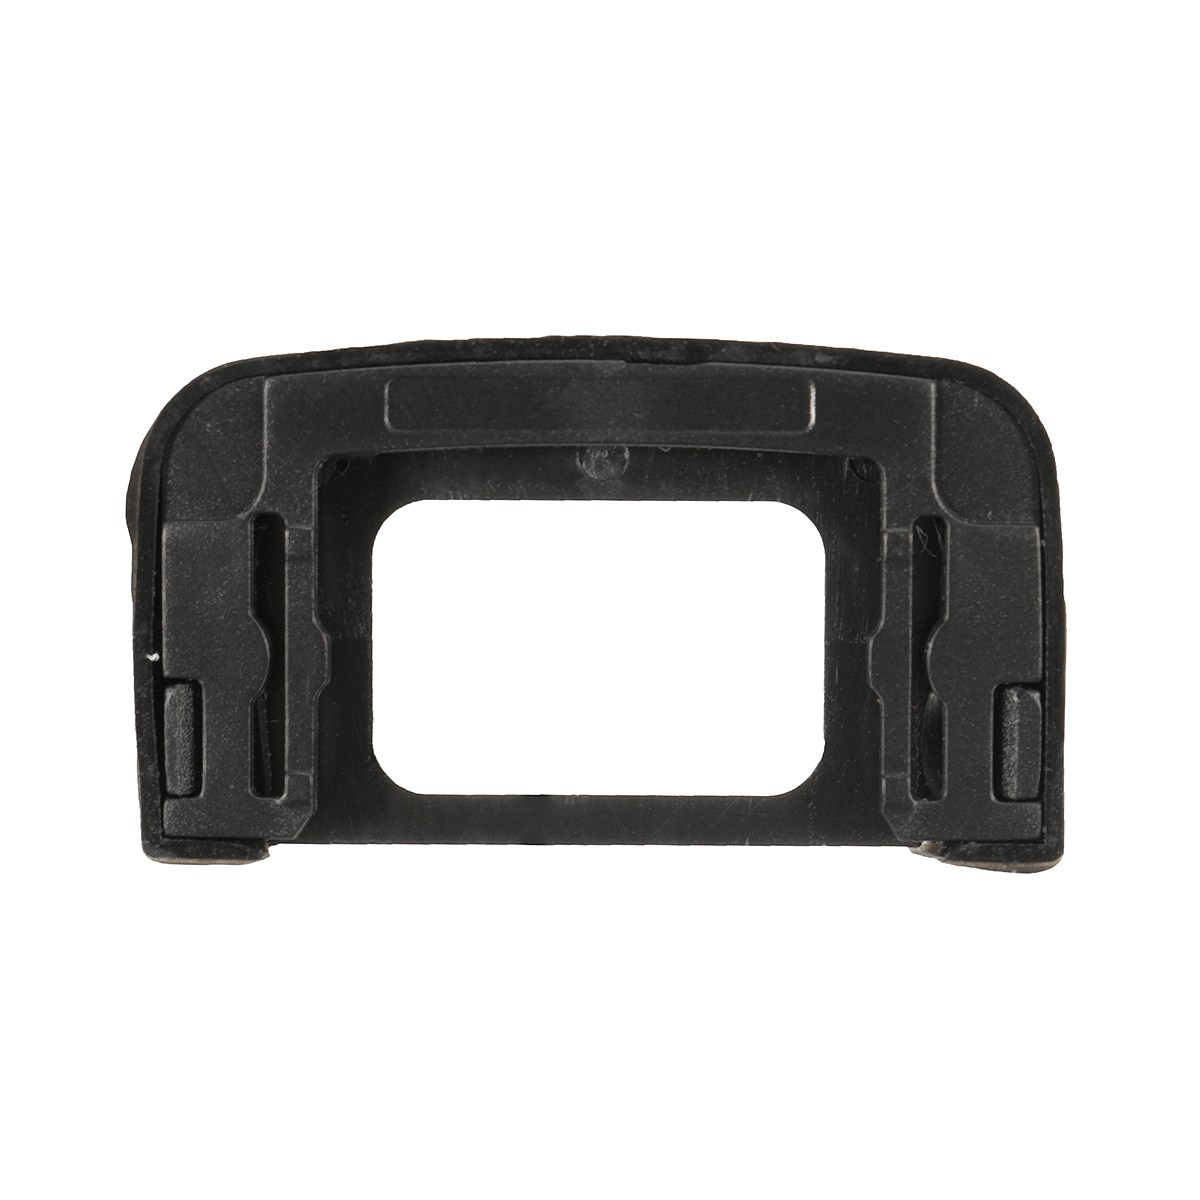 Black Eyecup Eyepiece for Nikon DK-25 DK25 camera D5600 D5500 D5300 D3400 D3300